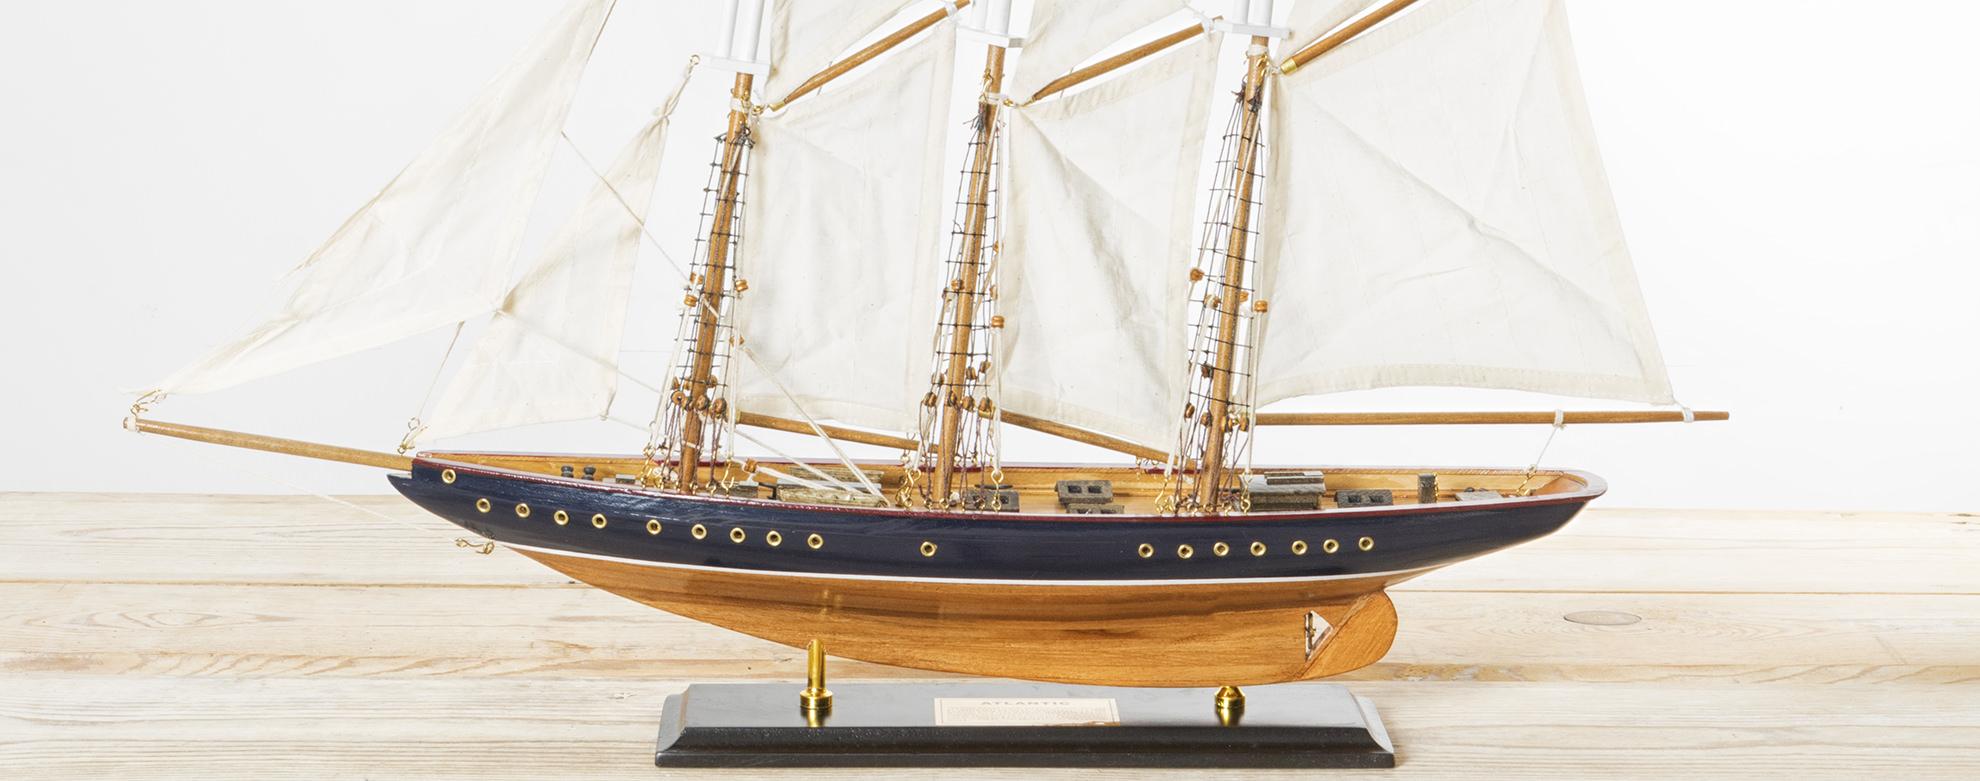 Modellschiffe Segelschiffe histor.